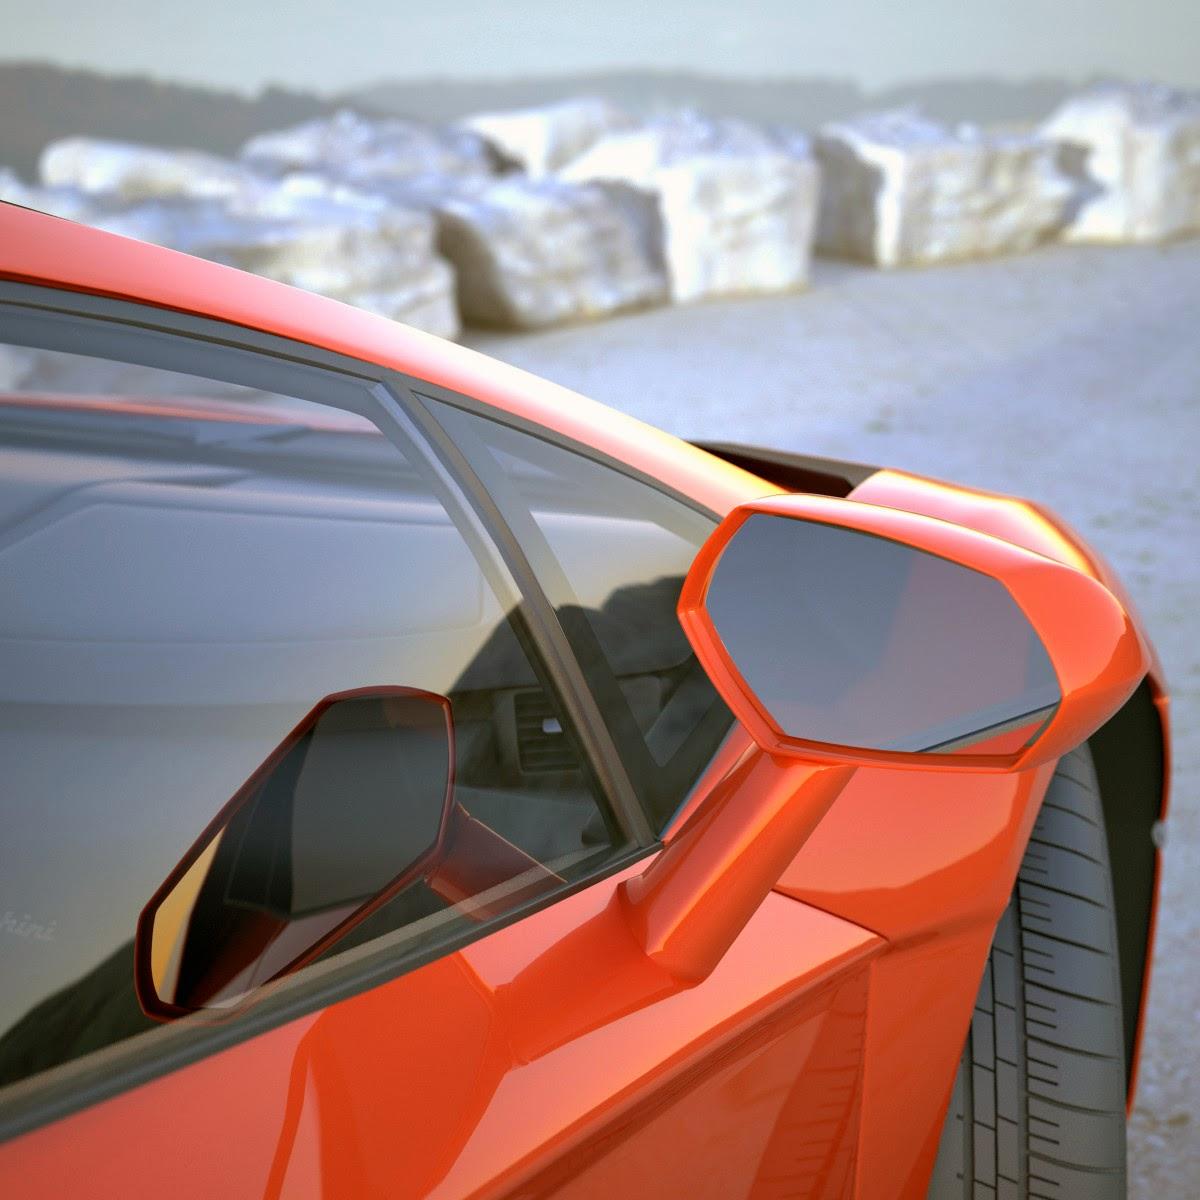 2014 Lamborghini Aventador Lp700 4: 3D.ART.Reactor: Lamborghini Aventador LP700-4